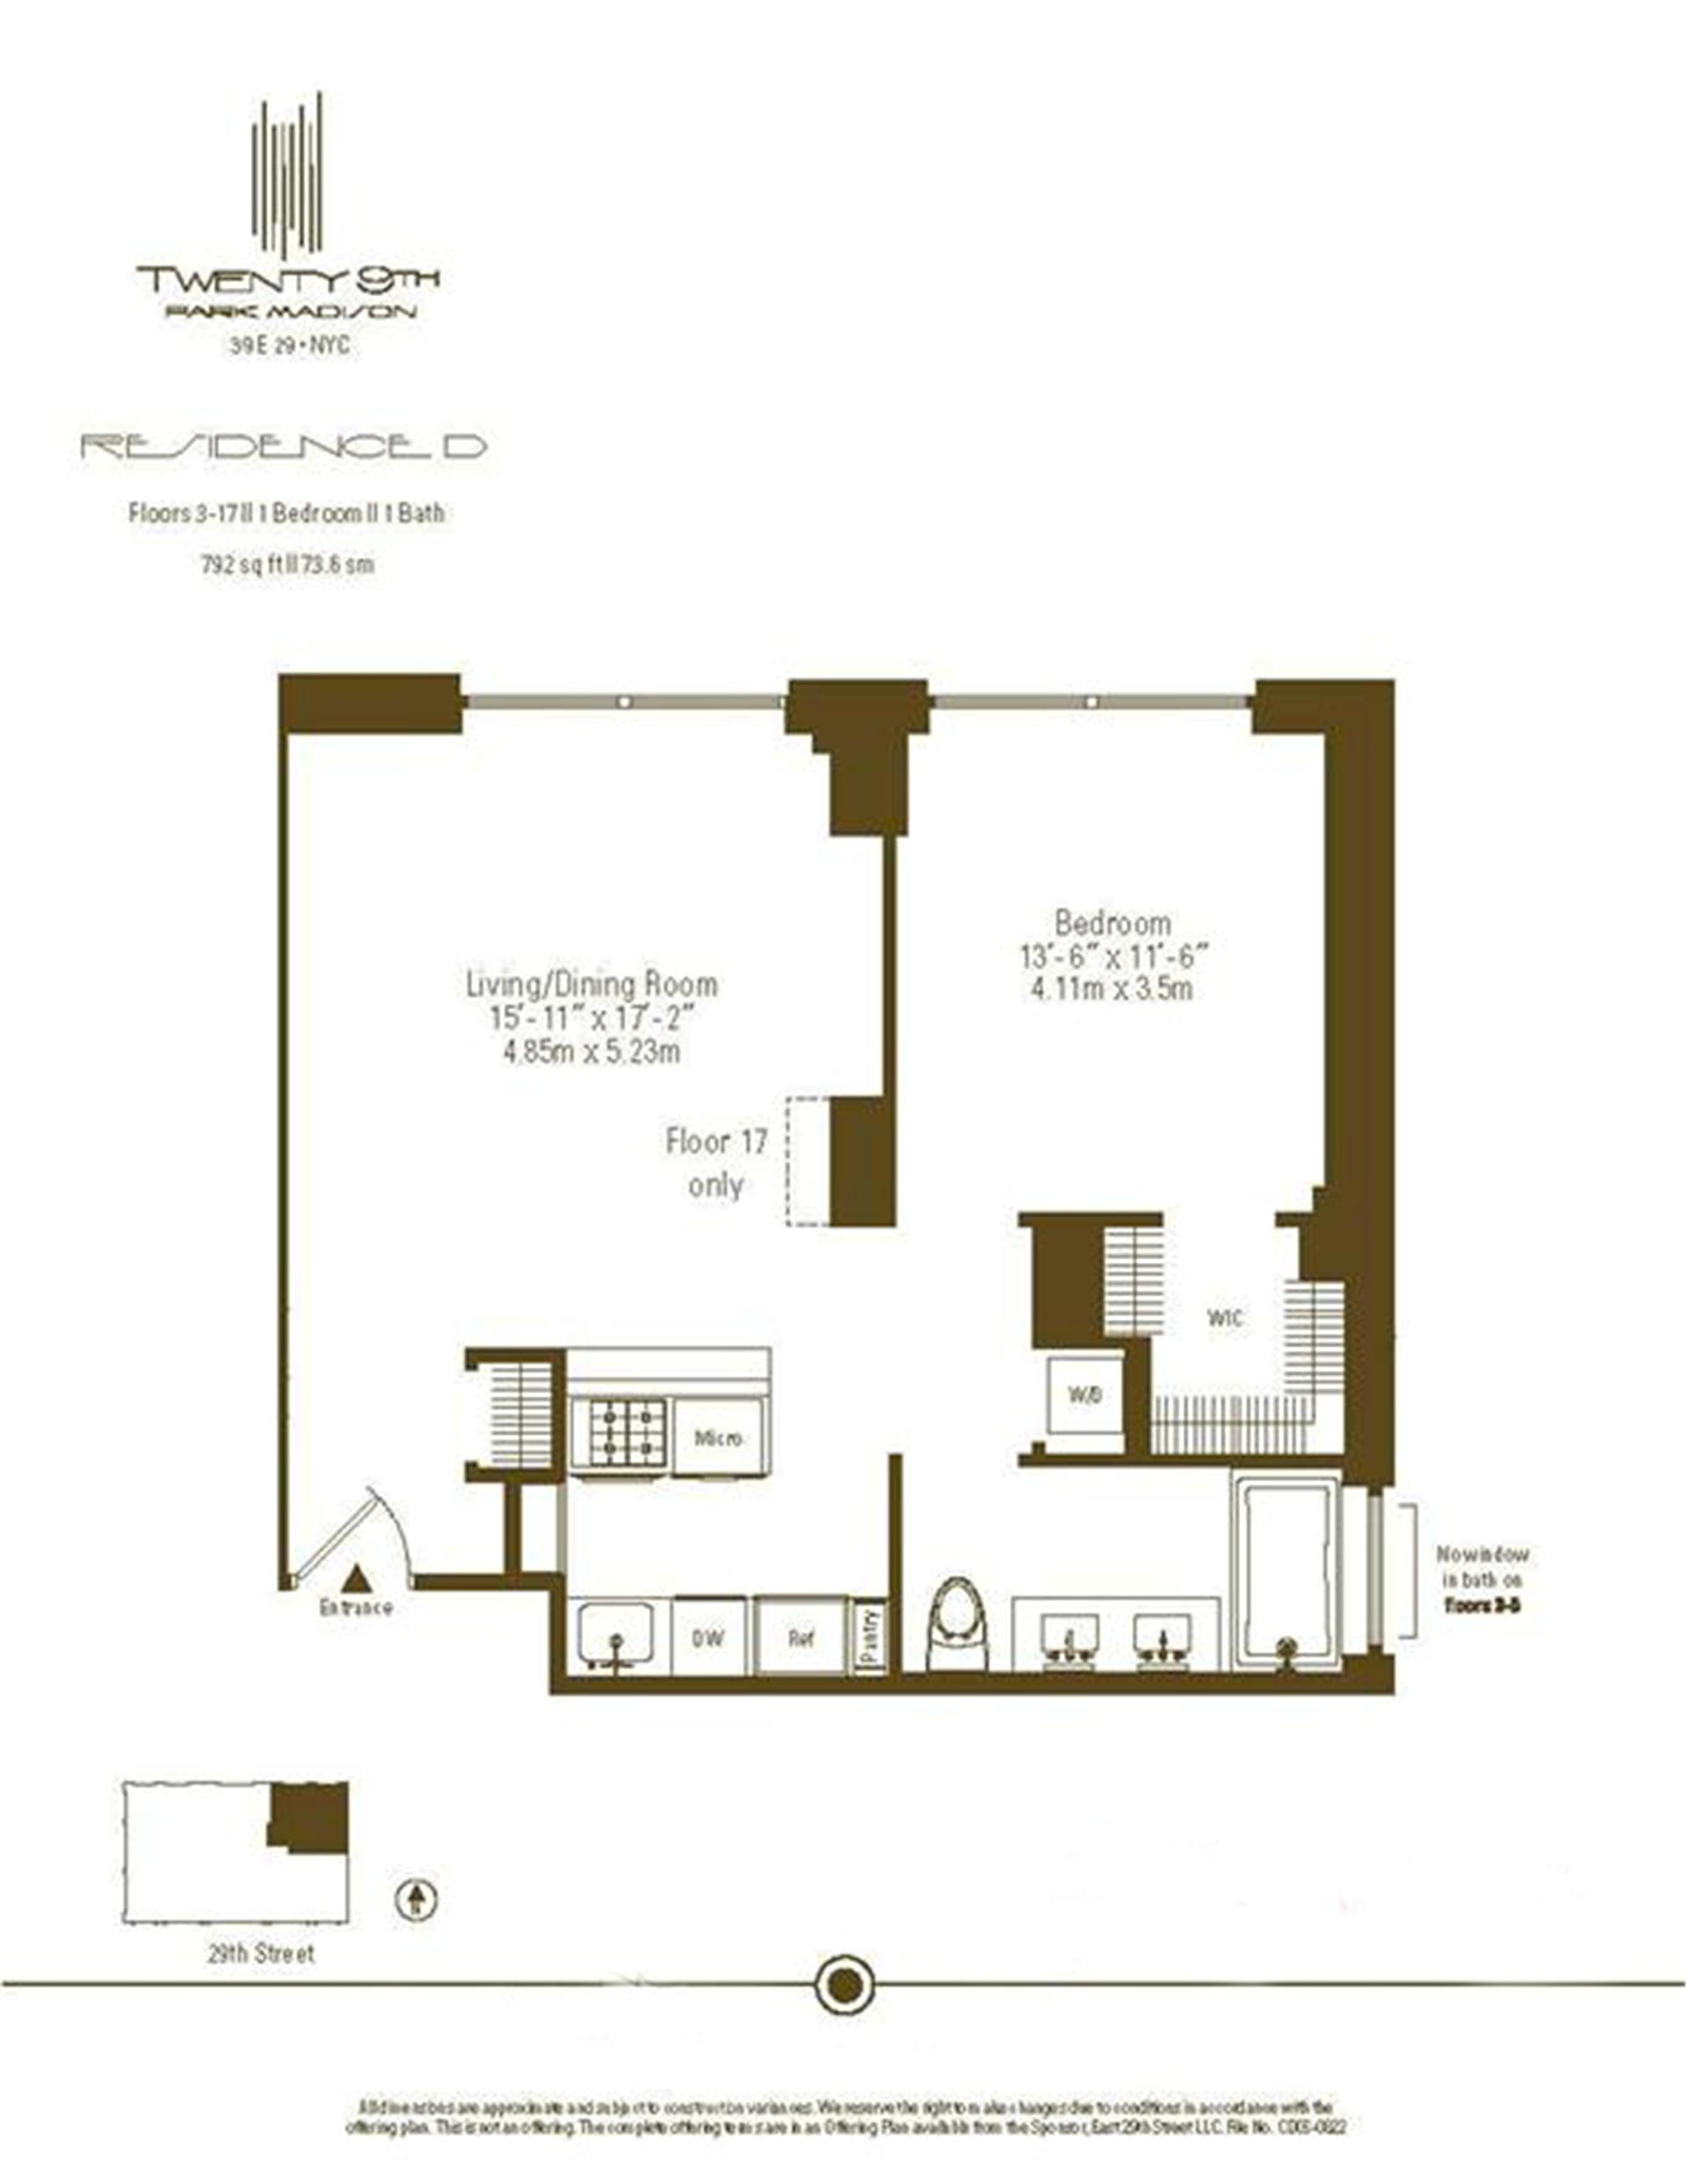 Floor plan of Twenty9th Park Madison, 39 East 29th St, 3D - Flatiron District, New York